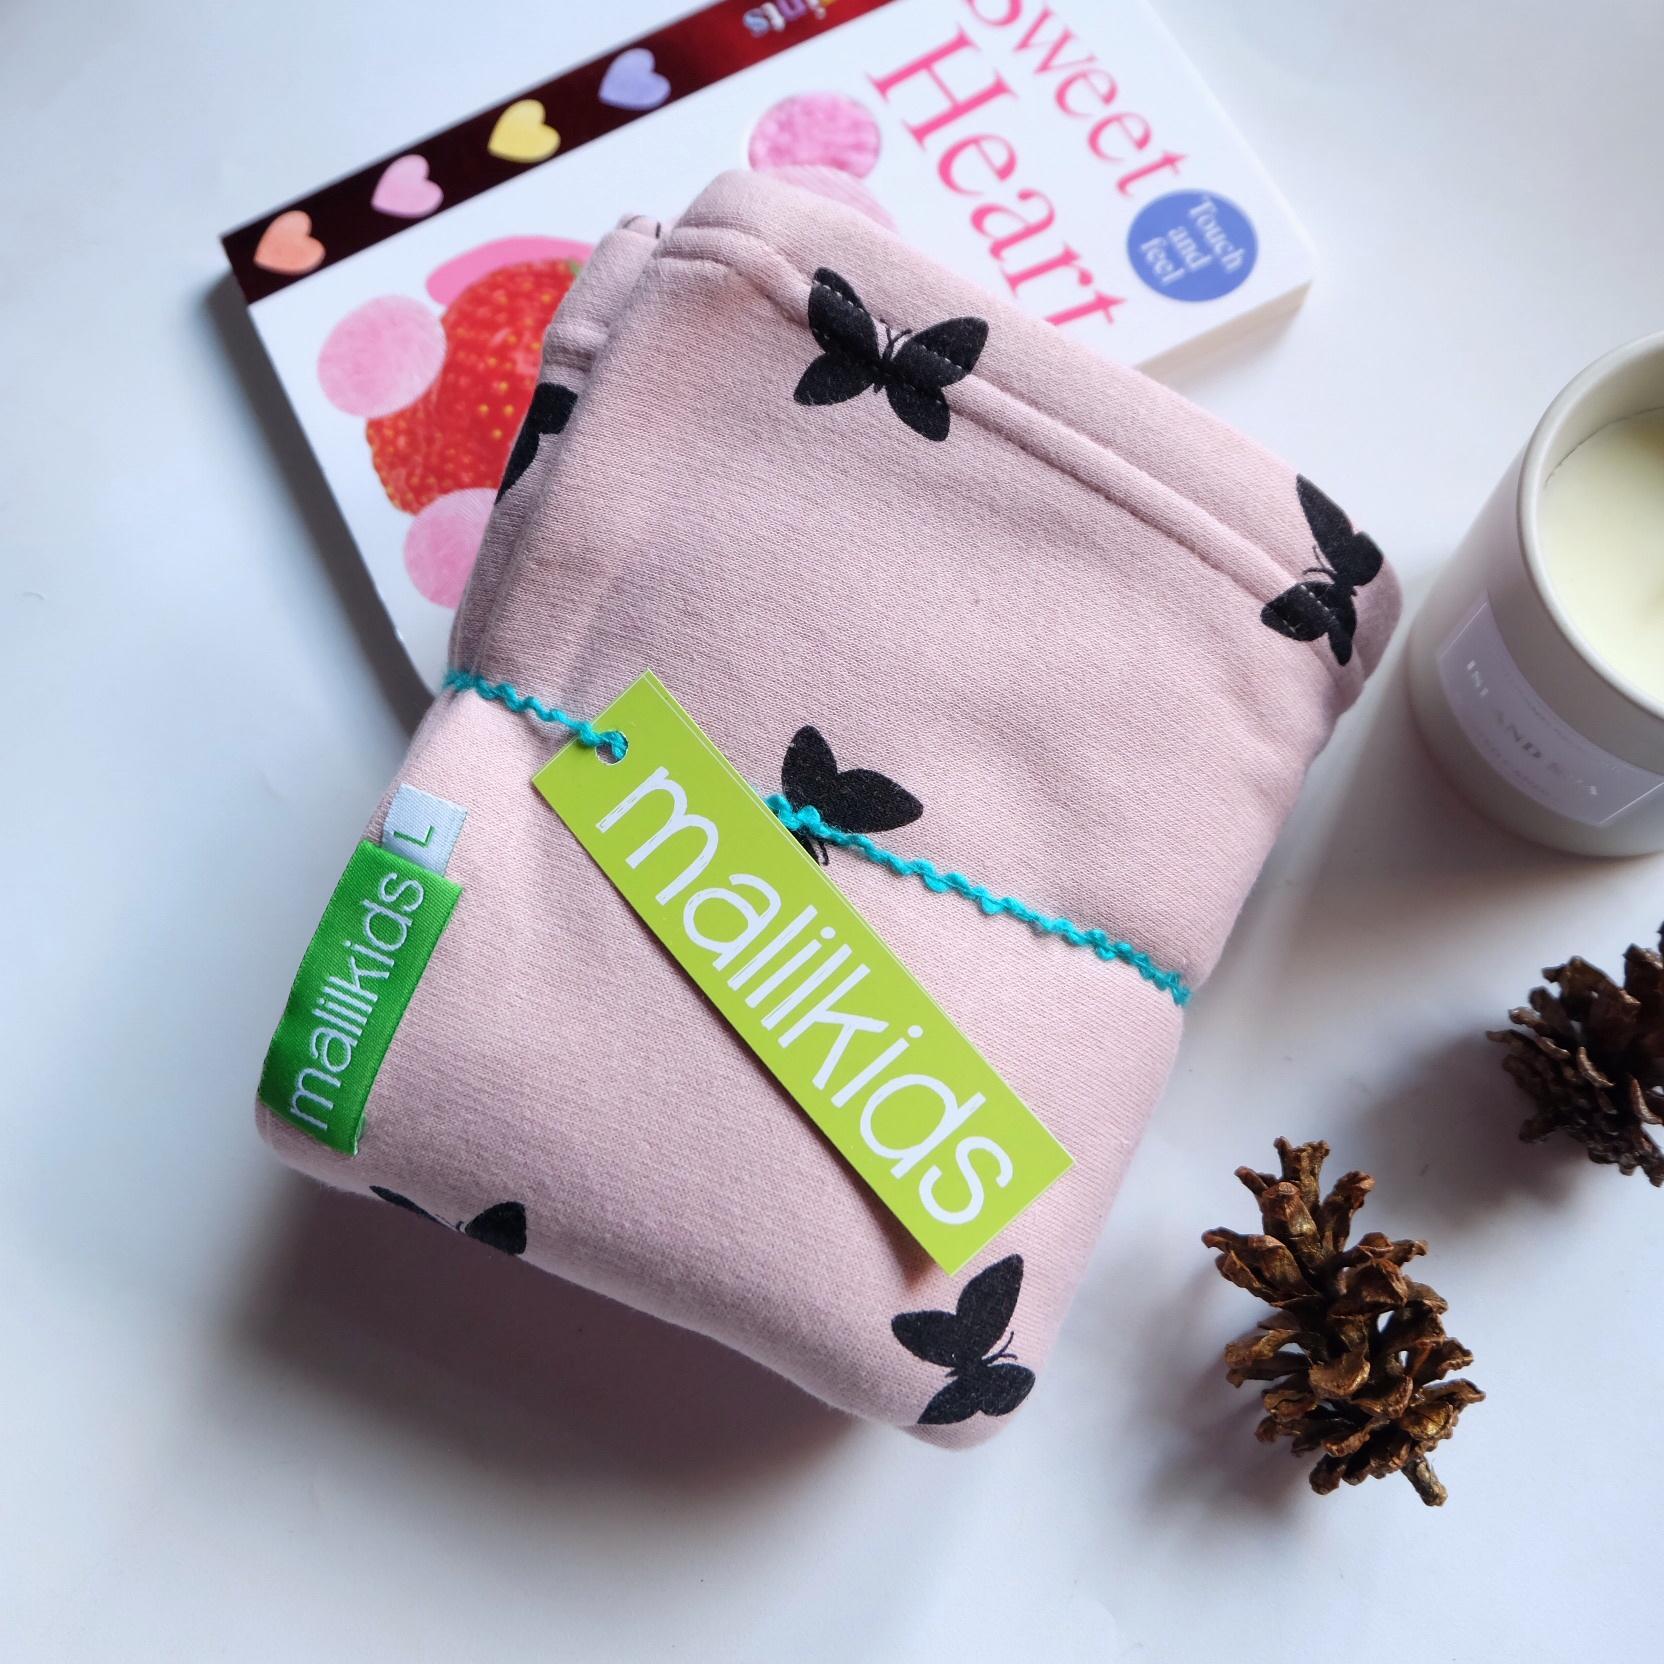 Detail Gambar Gratis Pouch! Size S - Malilkids Geos / Gendongan Kaos Premium / Gendongan Instan - Model Pink Butterfly Terbaru